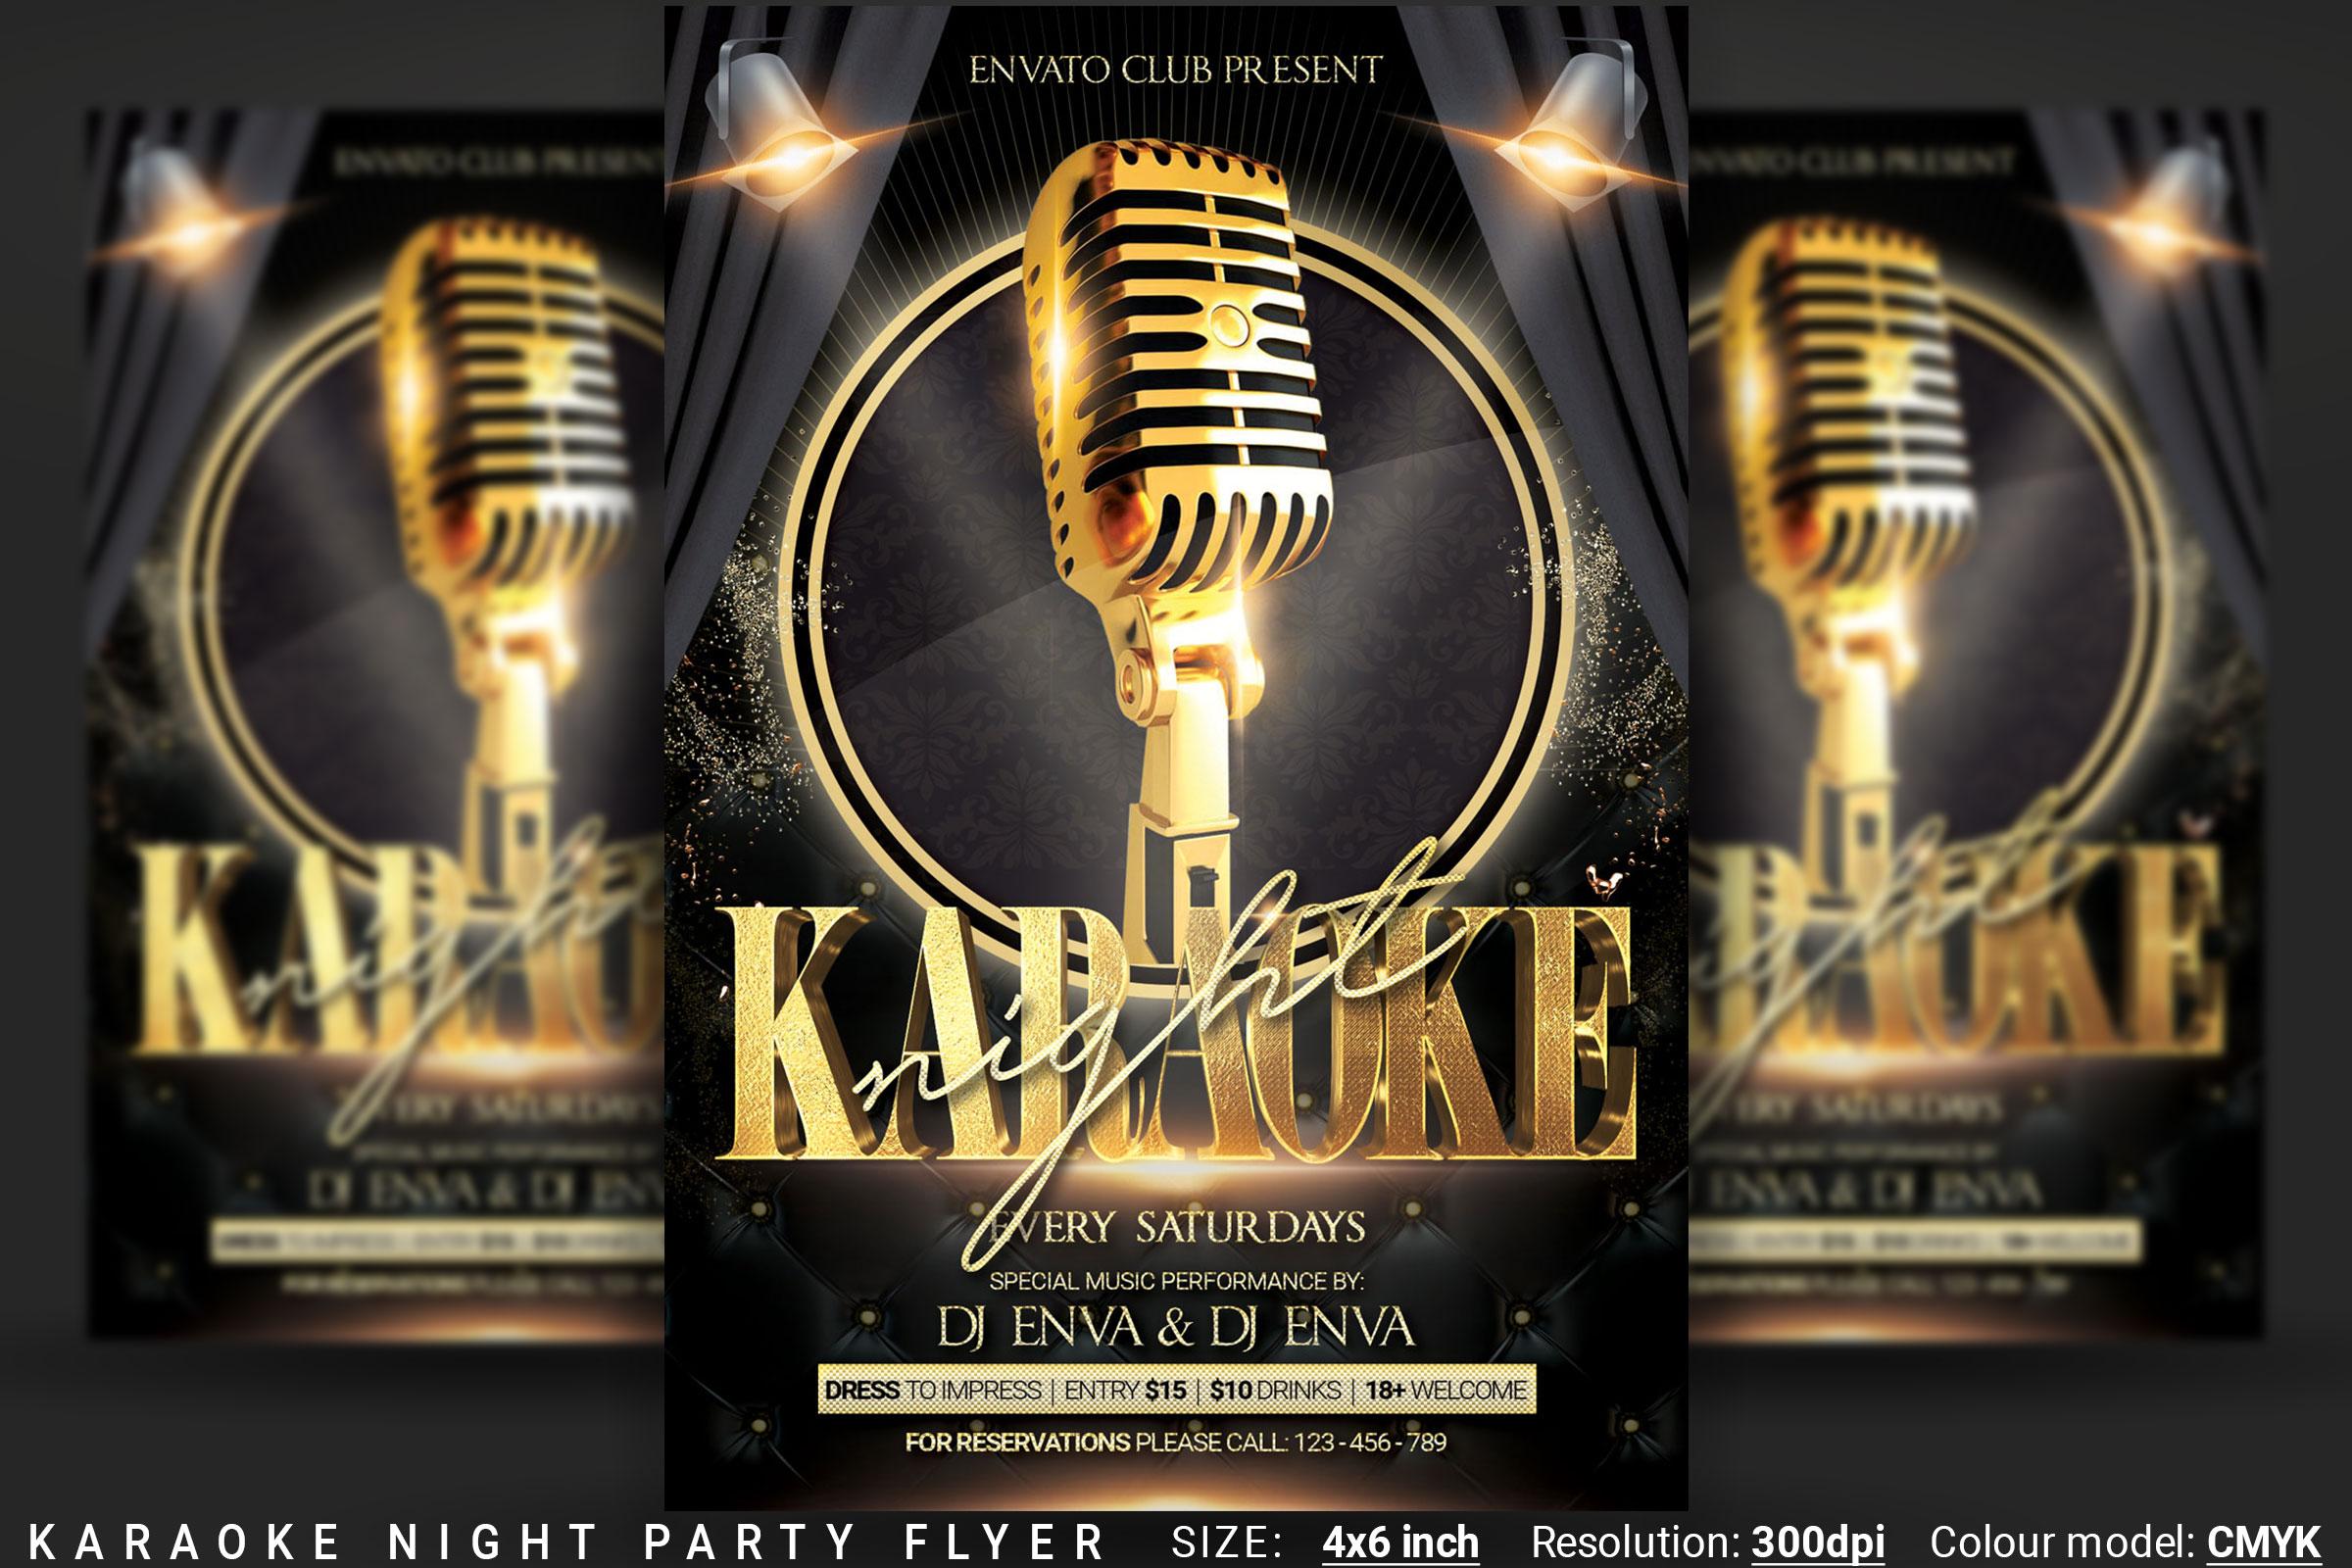 Karaoke Night Party Flyer example image 1